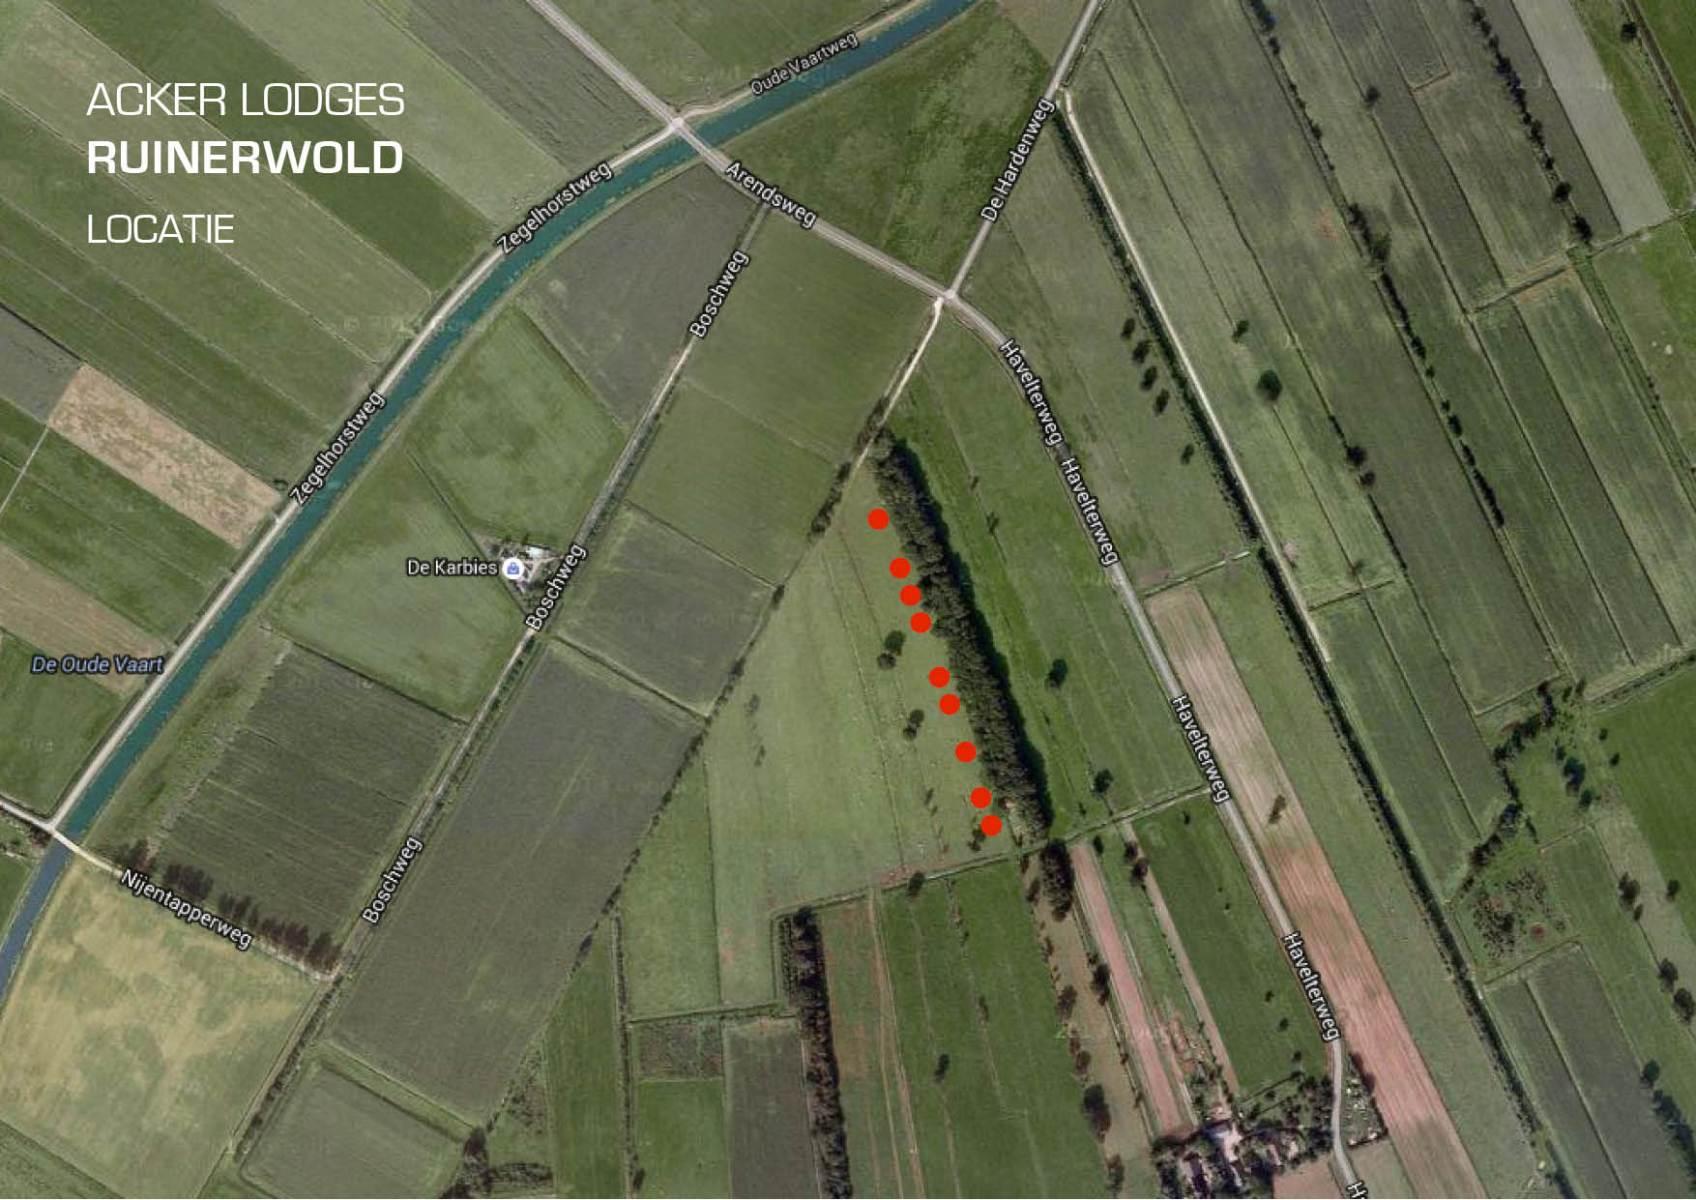 Acker-Lodges-Ruinerwold-Conceptstudie2